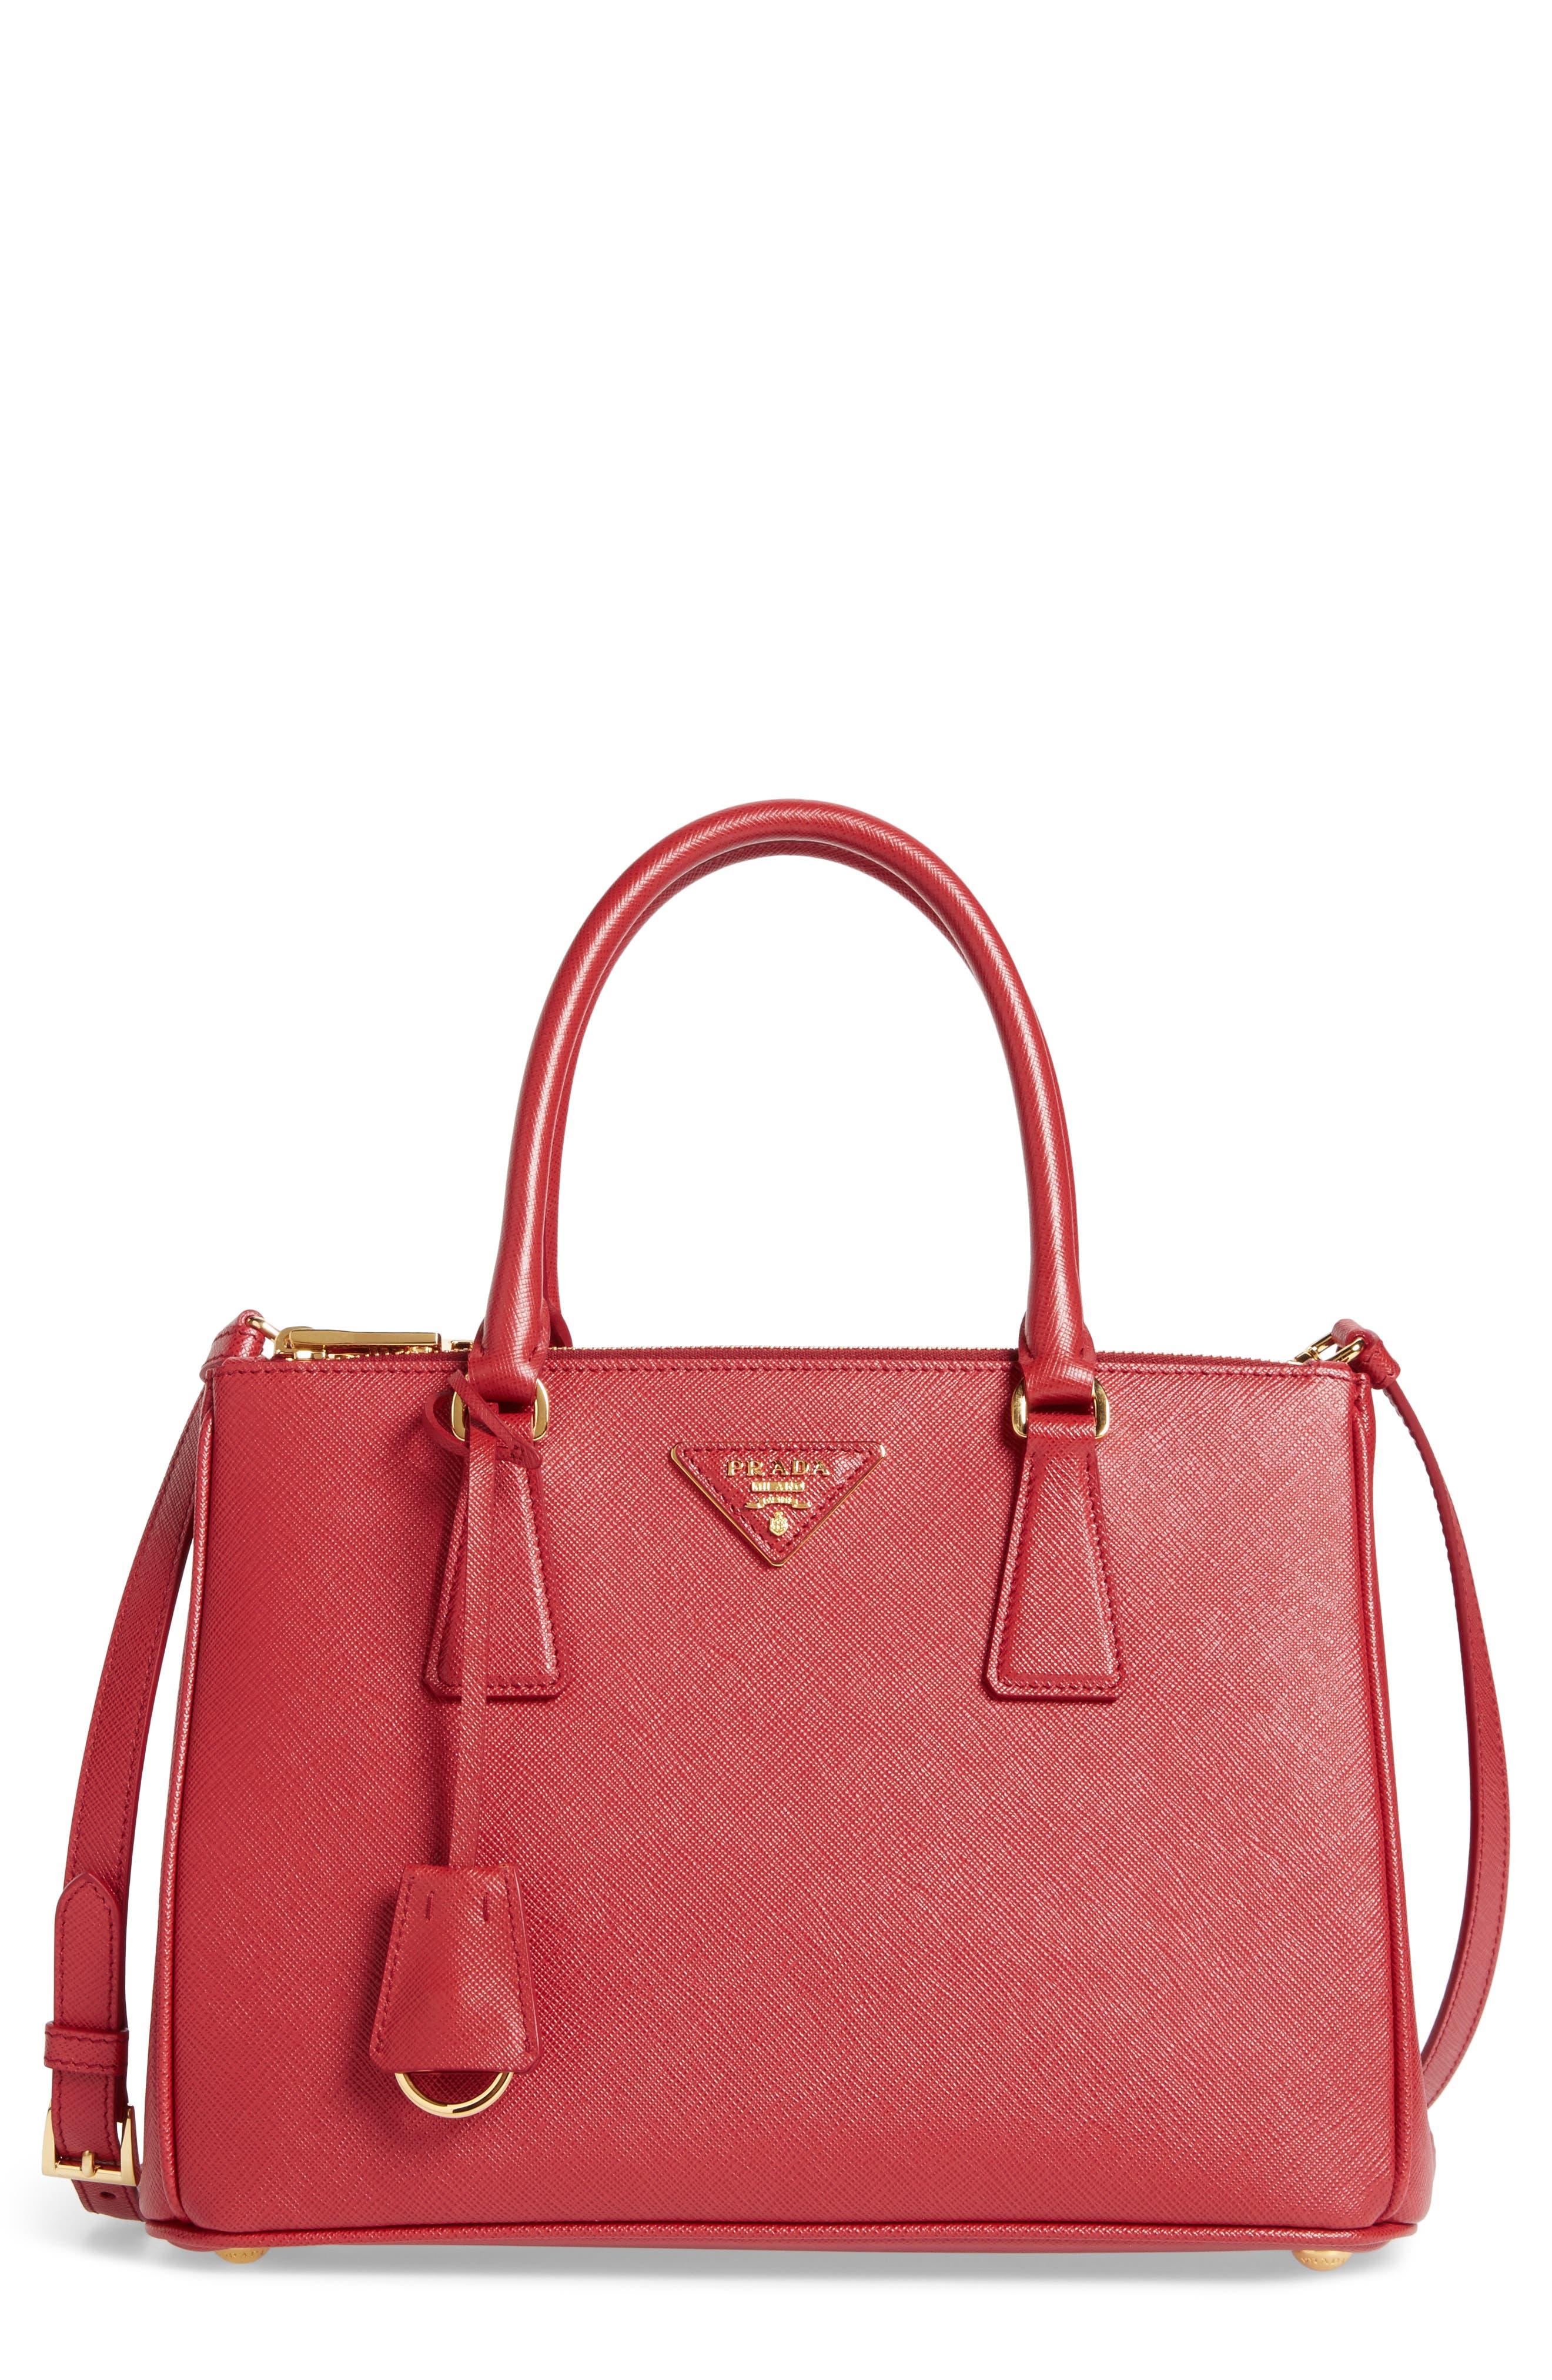 Saffiano Lux Leather Satchel,                         Main,                         color, Fuoco